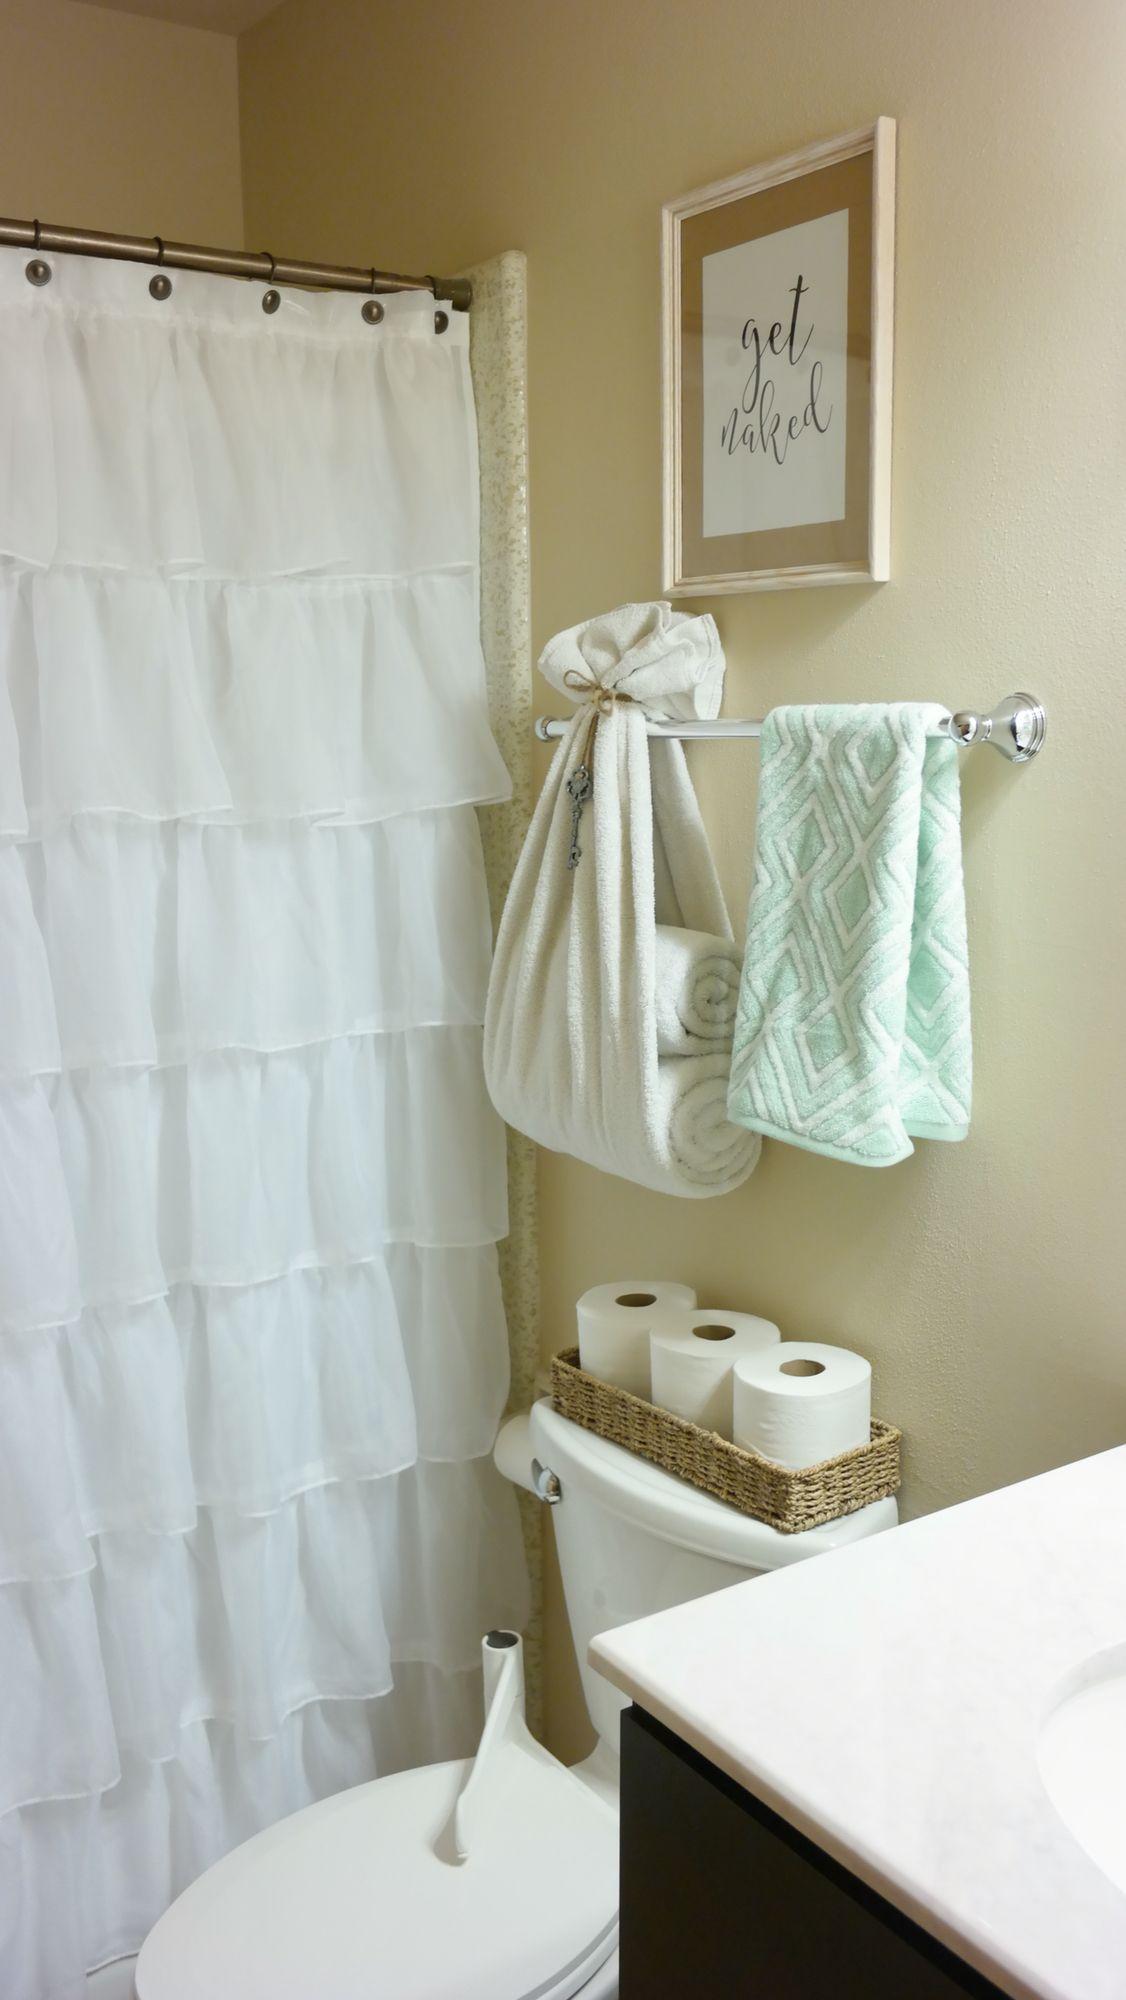 Bright and fresh bathroom decor ruffle shower curtain towel holder